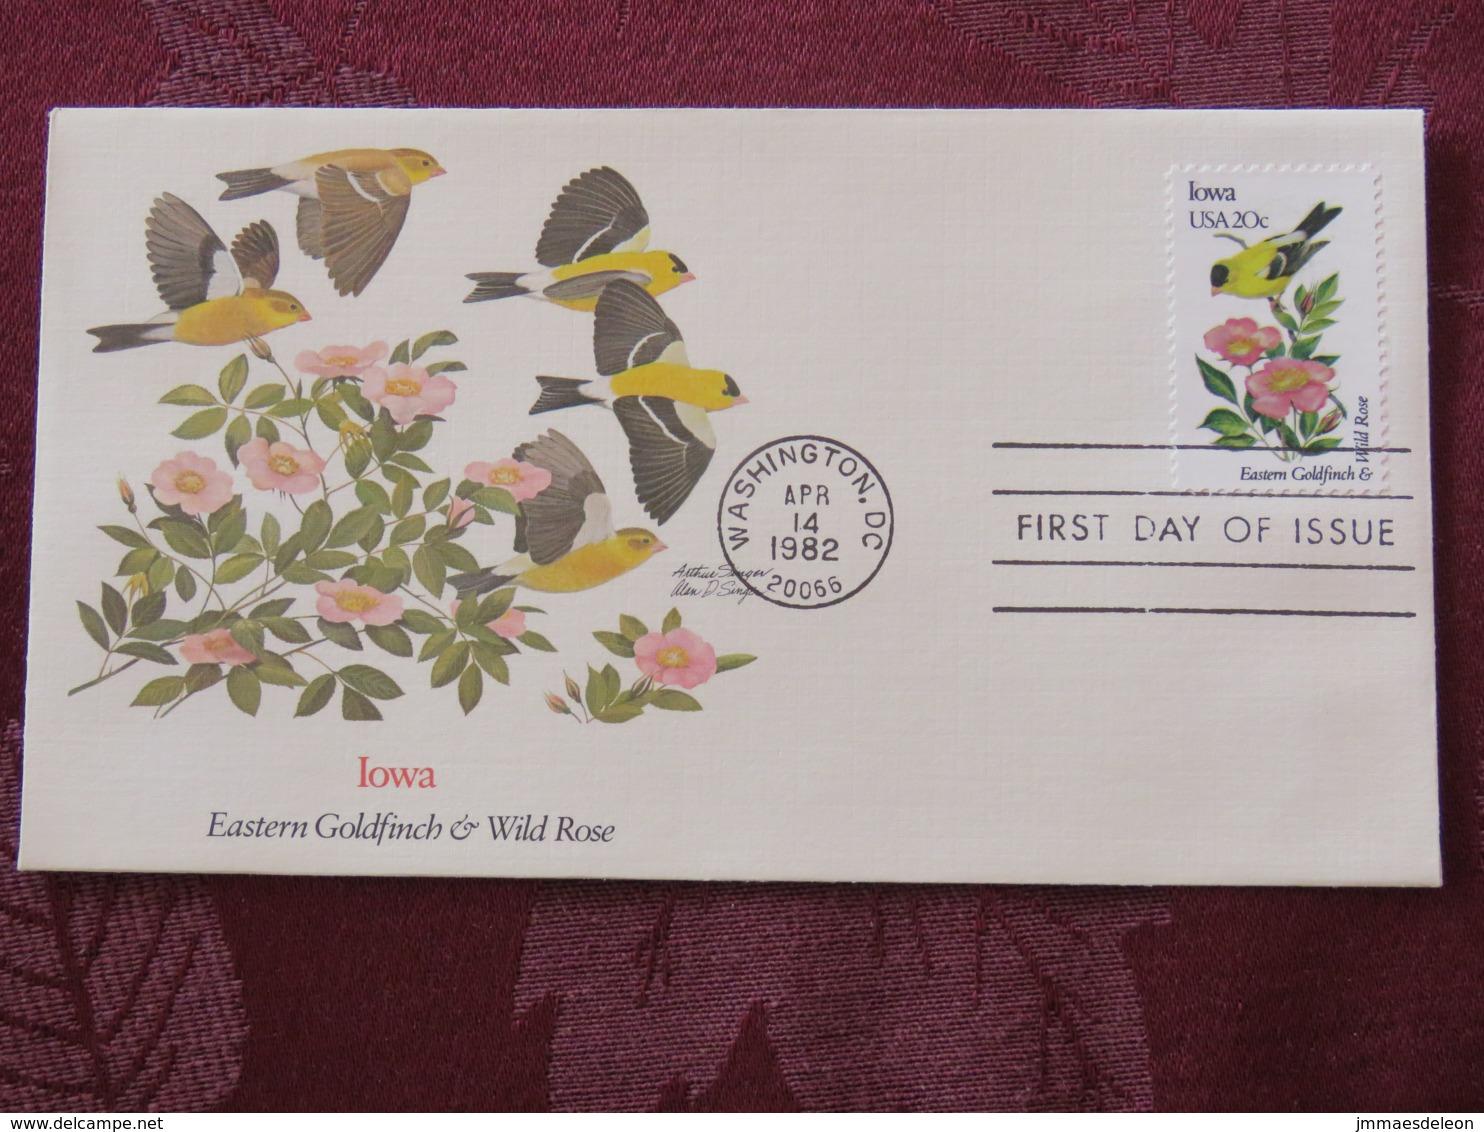 USA 1982 FDC Cover Washington - Iowa State Bird And Flower - Goldfinch - Etats-Unis